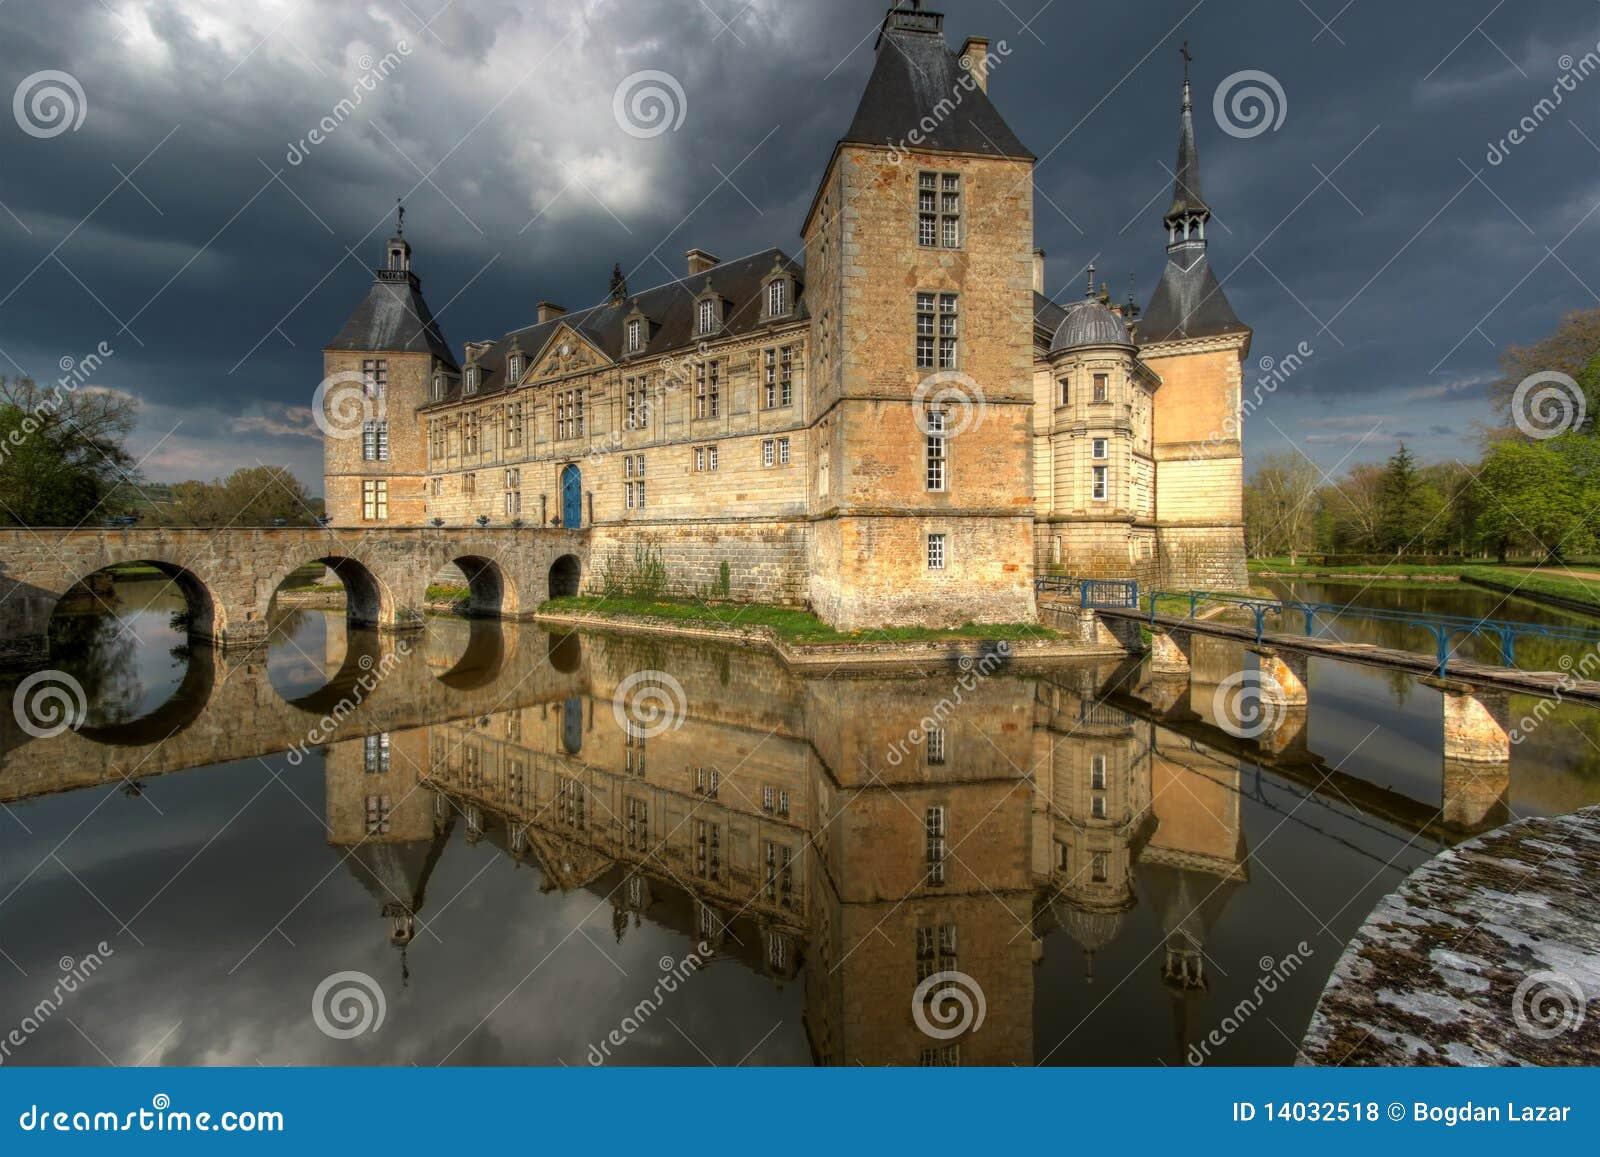 Chateau de Sully 01, Burgundy, France